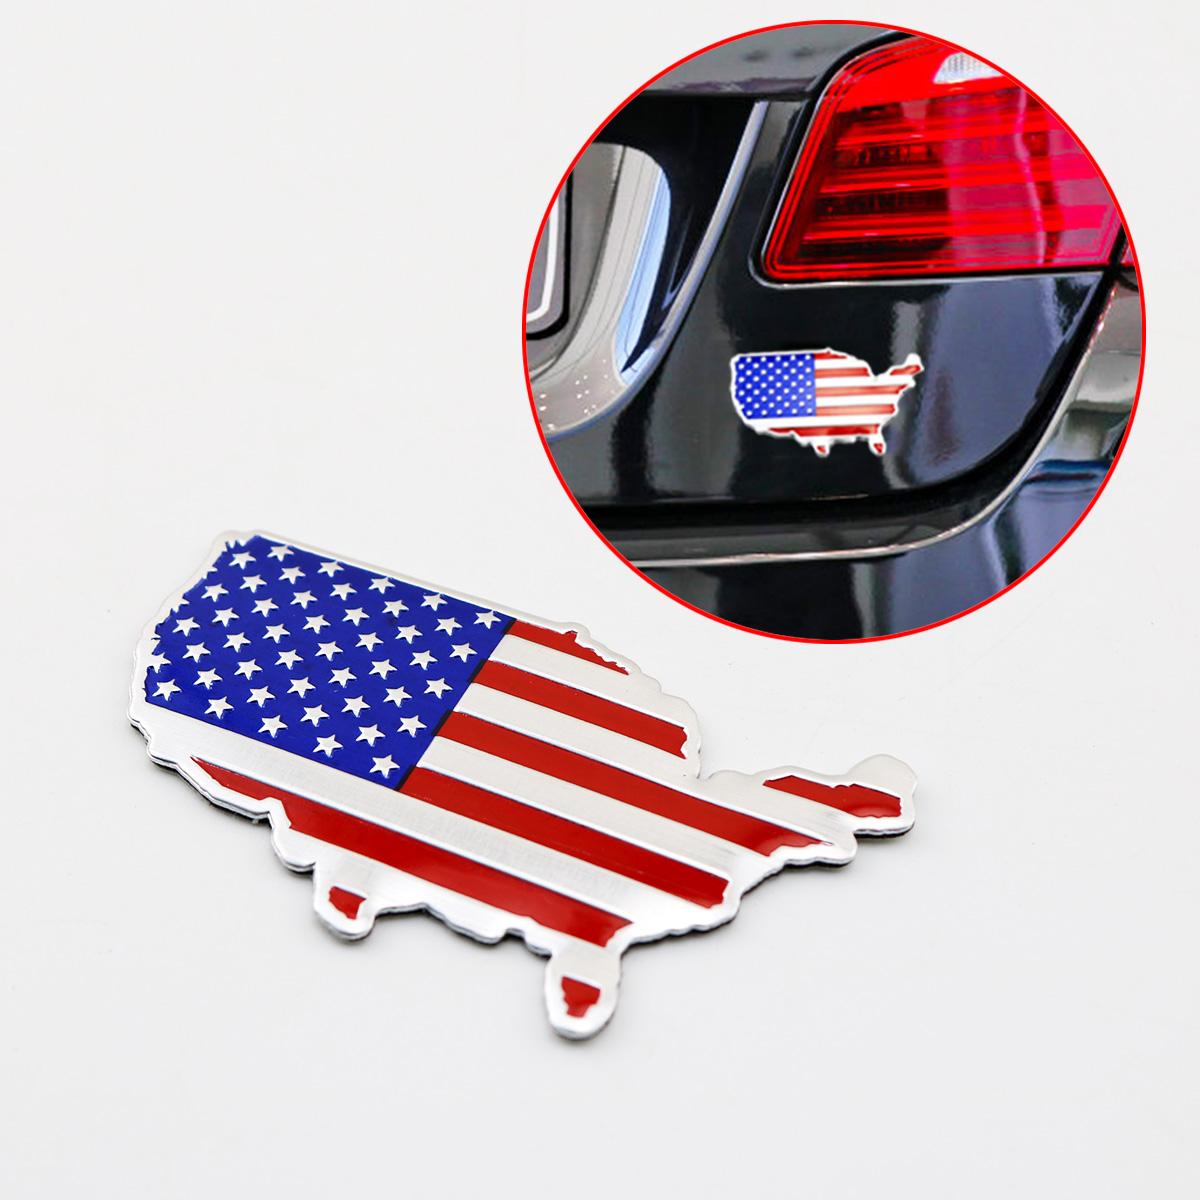 2x Car Accessories F1 Flag Emblems Side Rear Decals Fender Sticker For Chevrolet